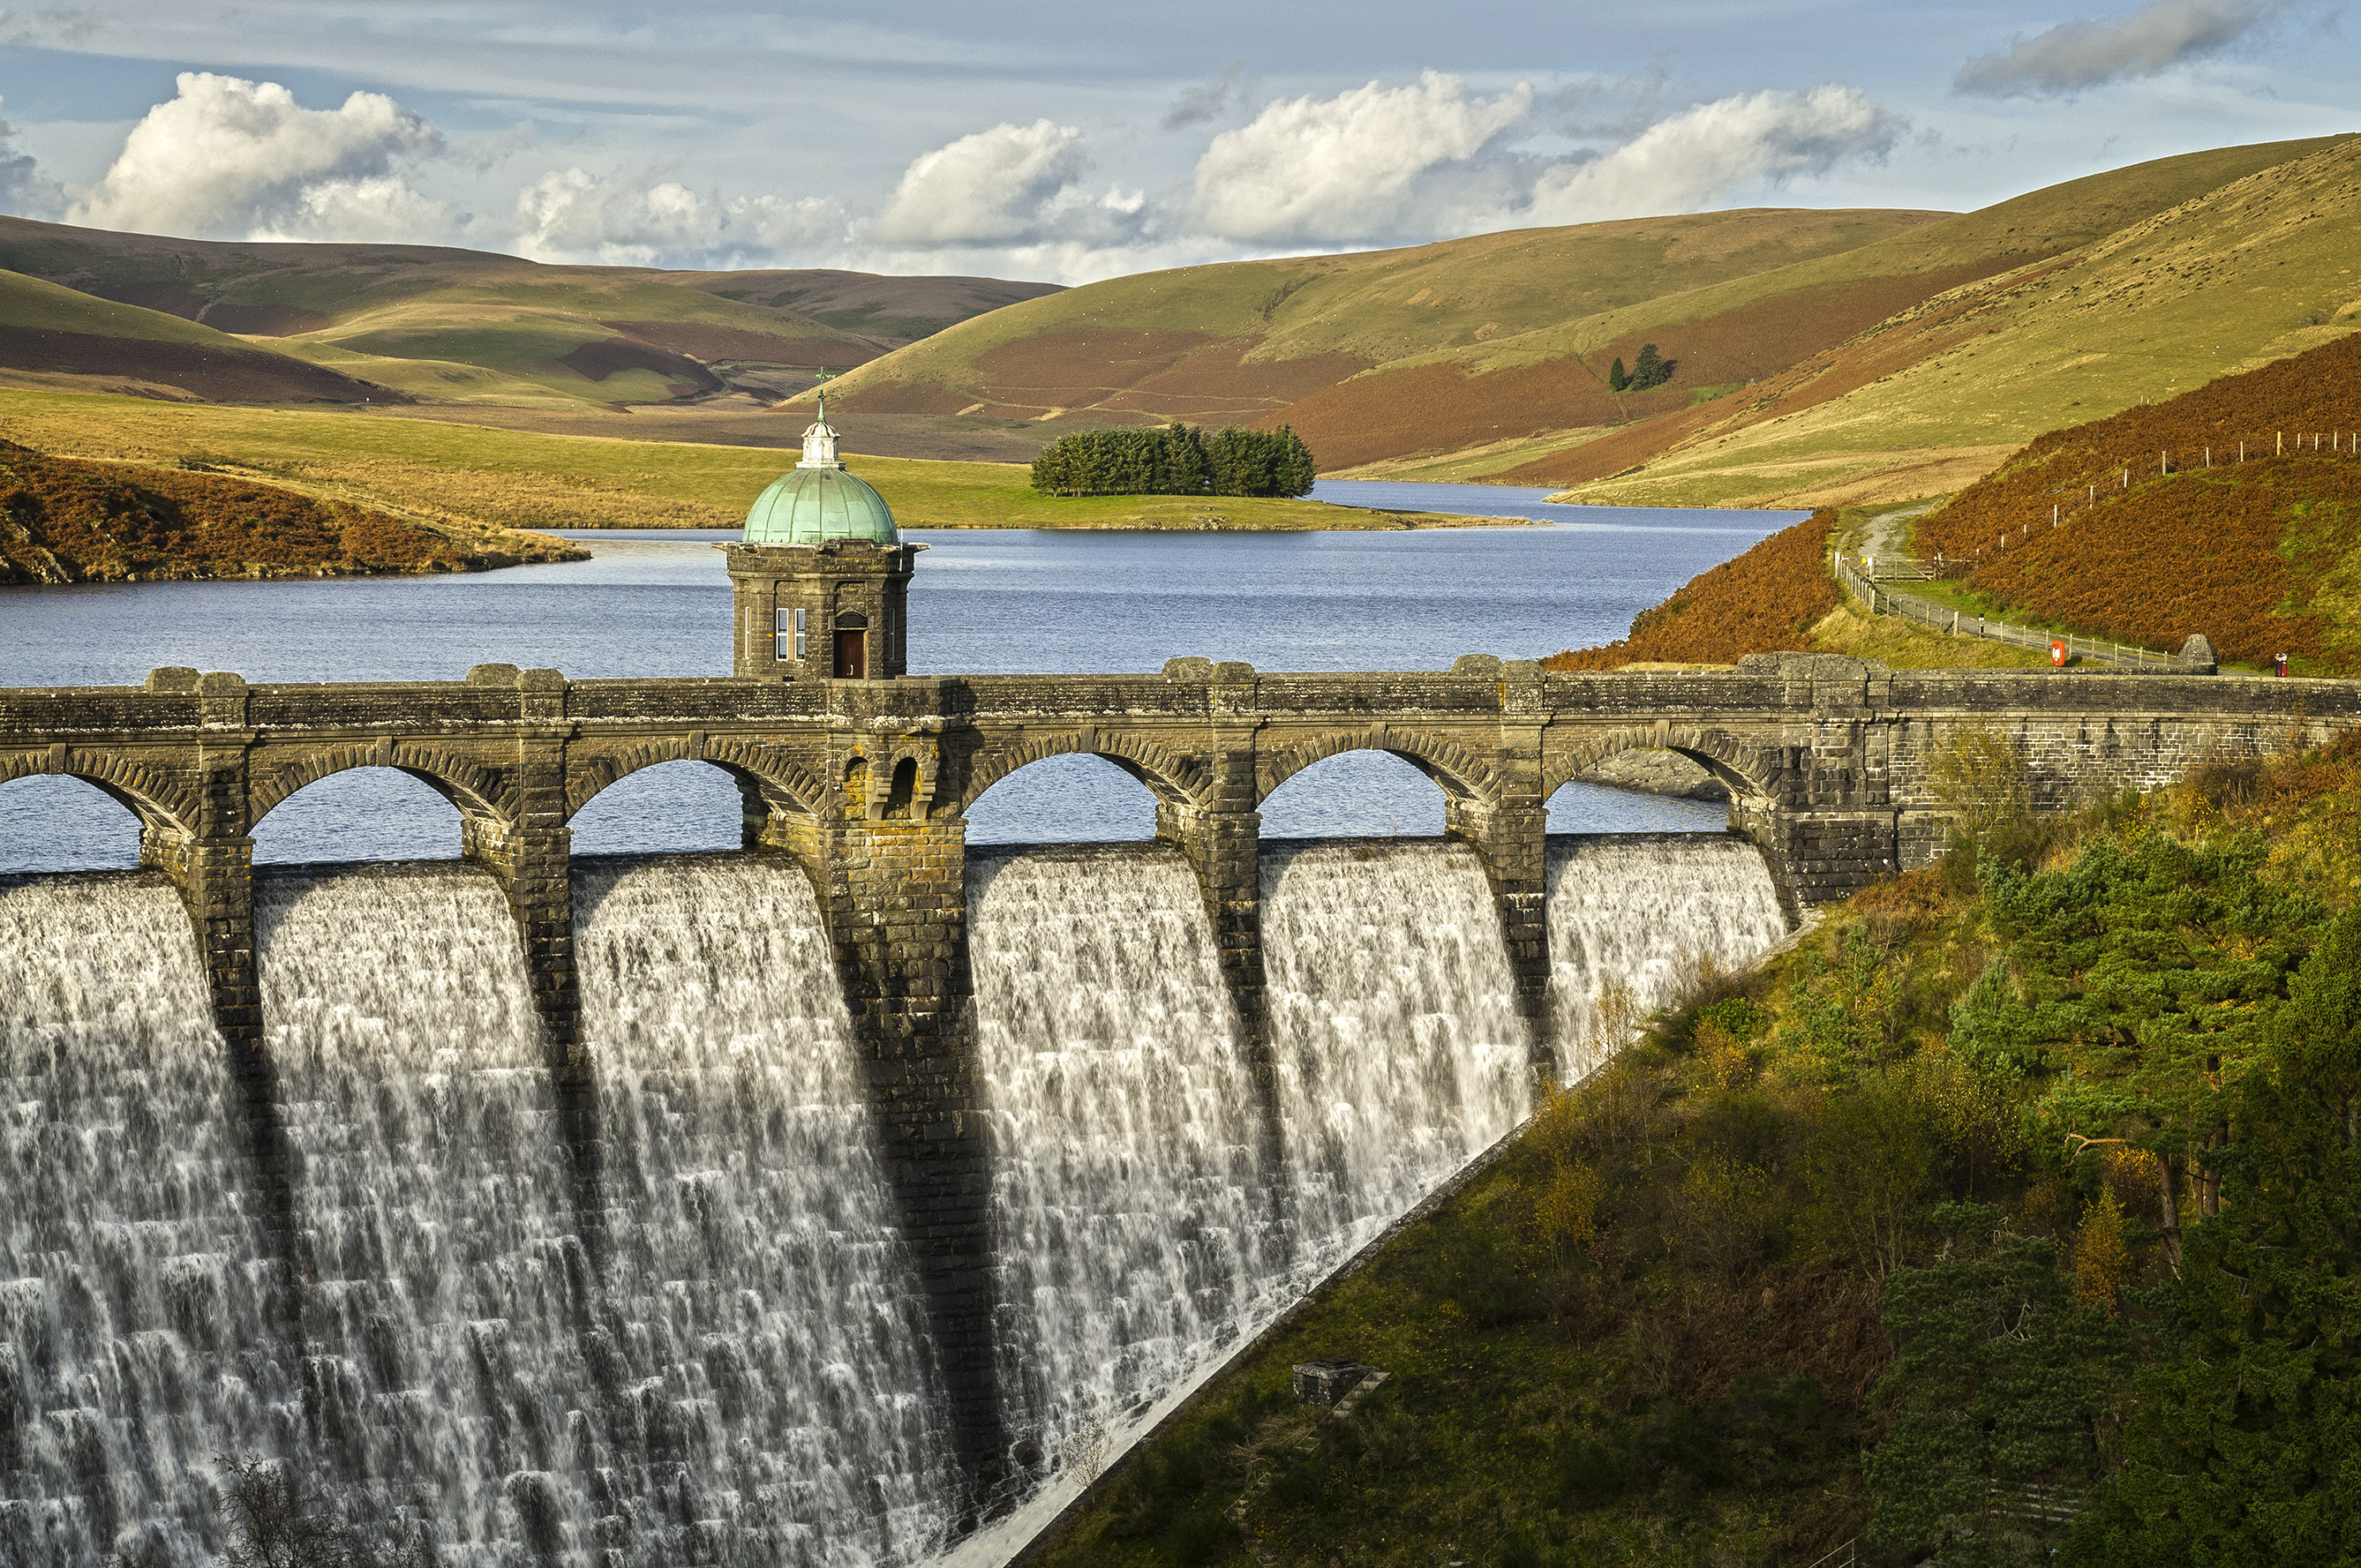 Craig Goch Dam and Reservoir Elan Valley in Mid Wales